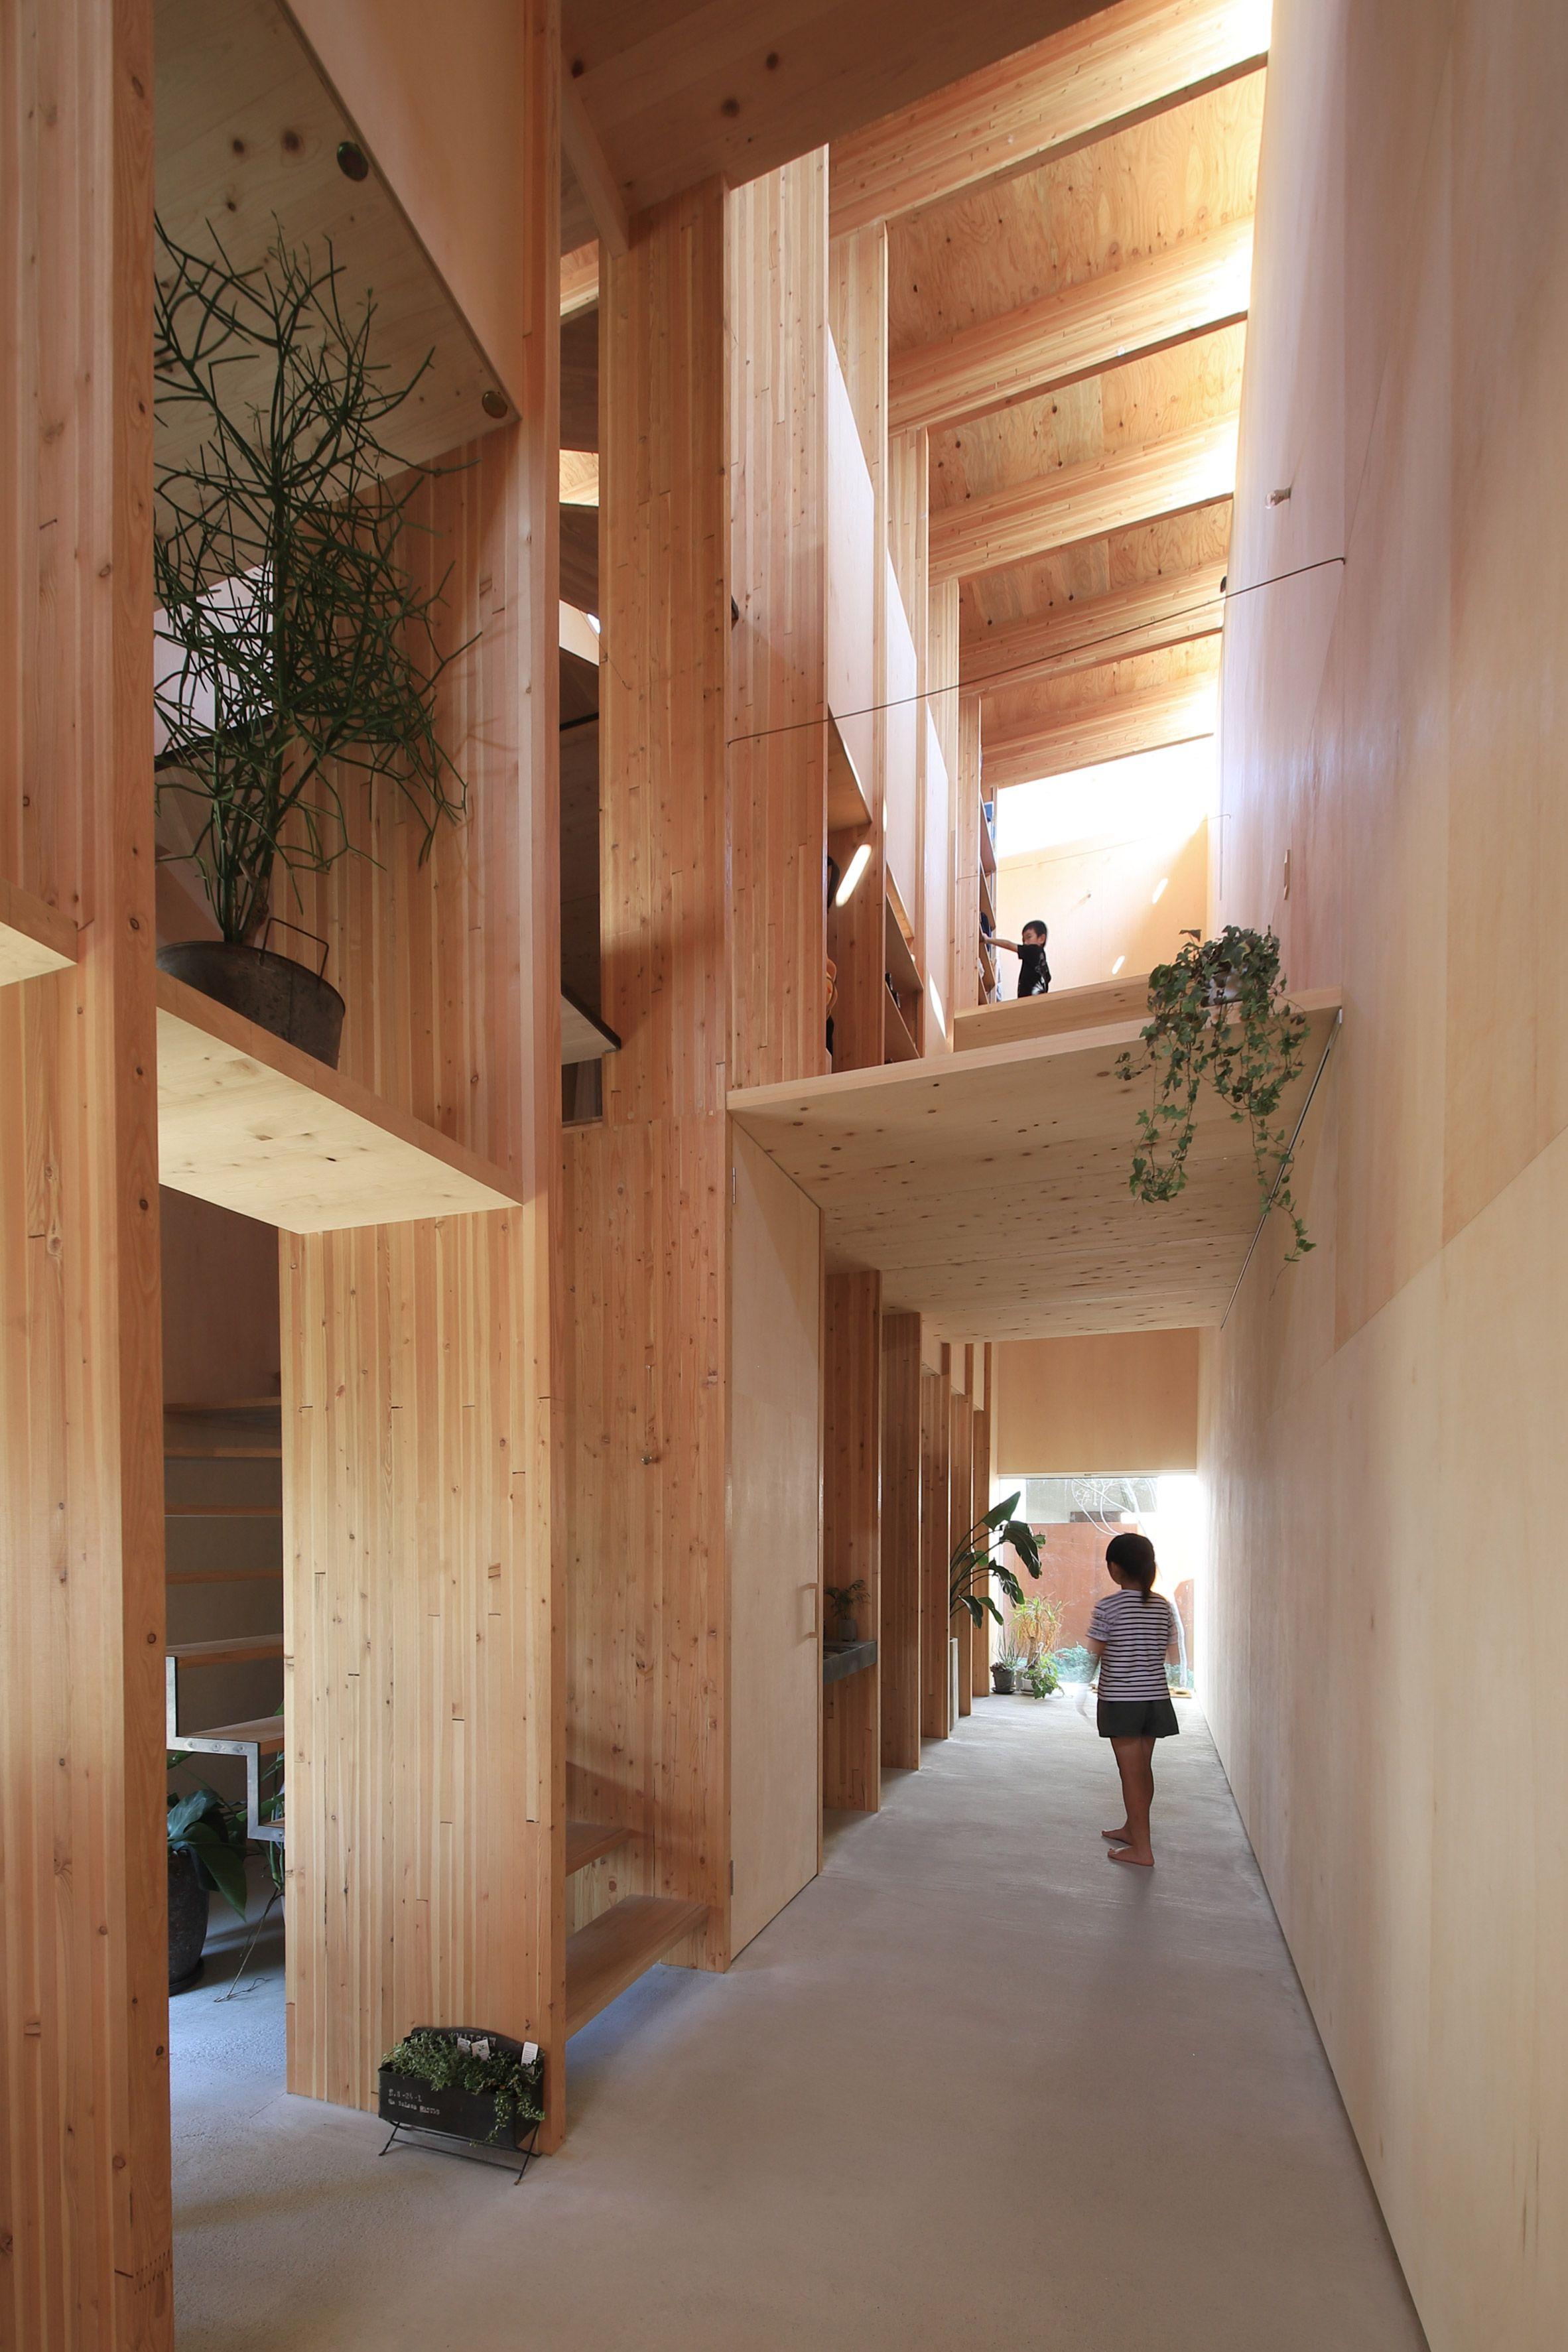 Httpswwwdezeencom20180831T Noie Minimalist House Japan Katsutoshi Sasakiutm Medium=Email&Utm Campaign=Daily%20Dezeen%20Di